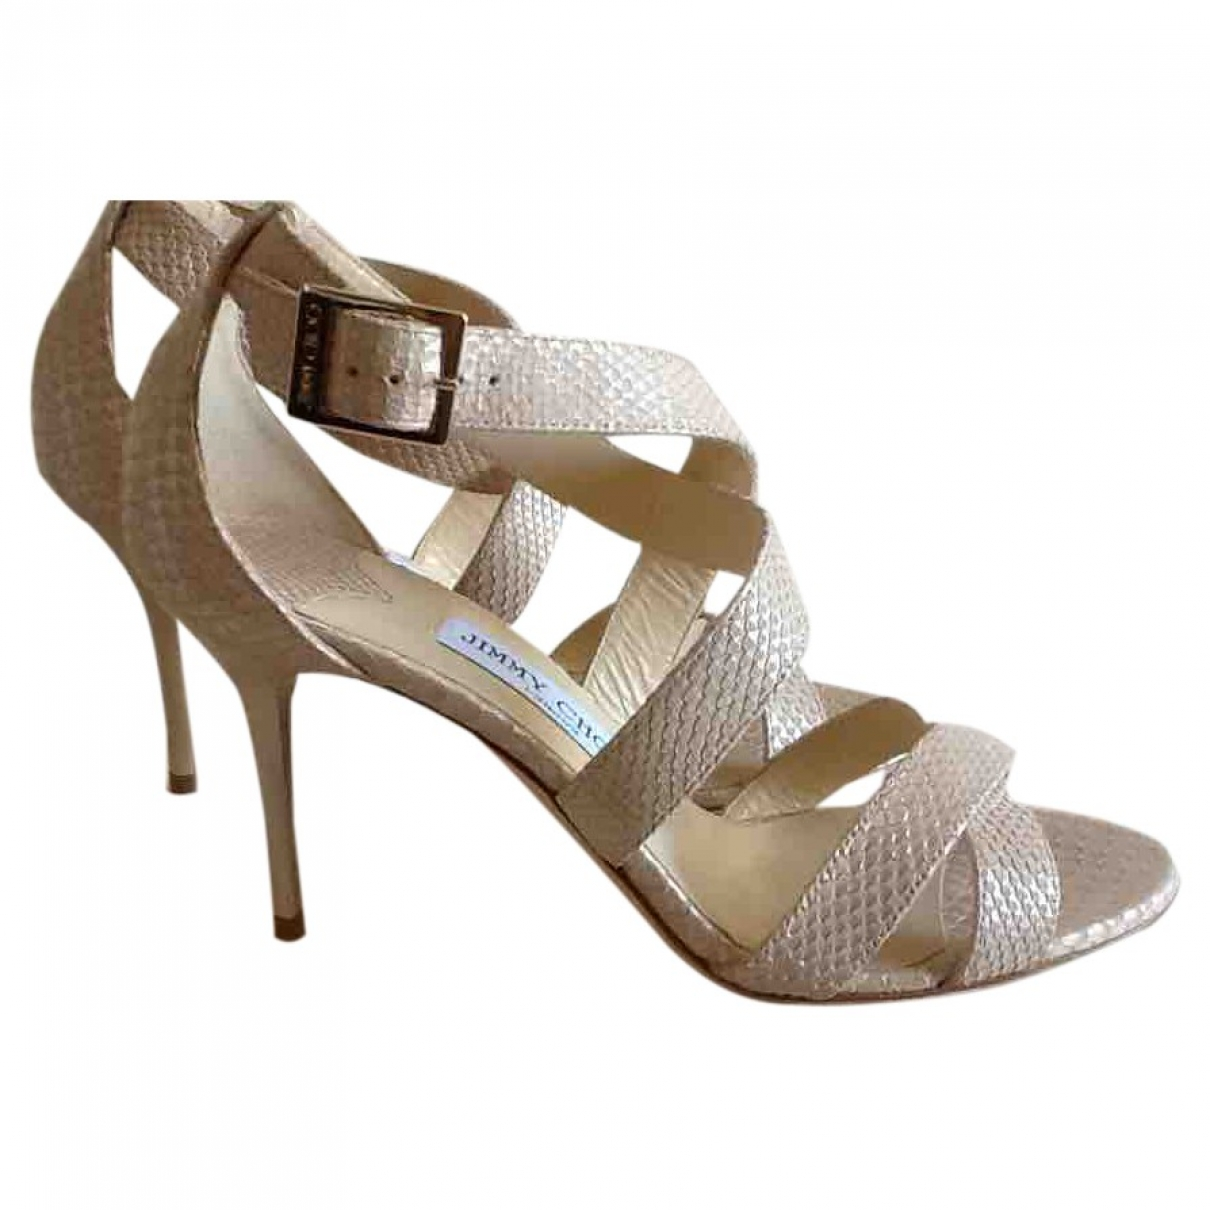 Jimmy Choo Emily Beige Leather Sandals for Women 38.5 EU